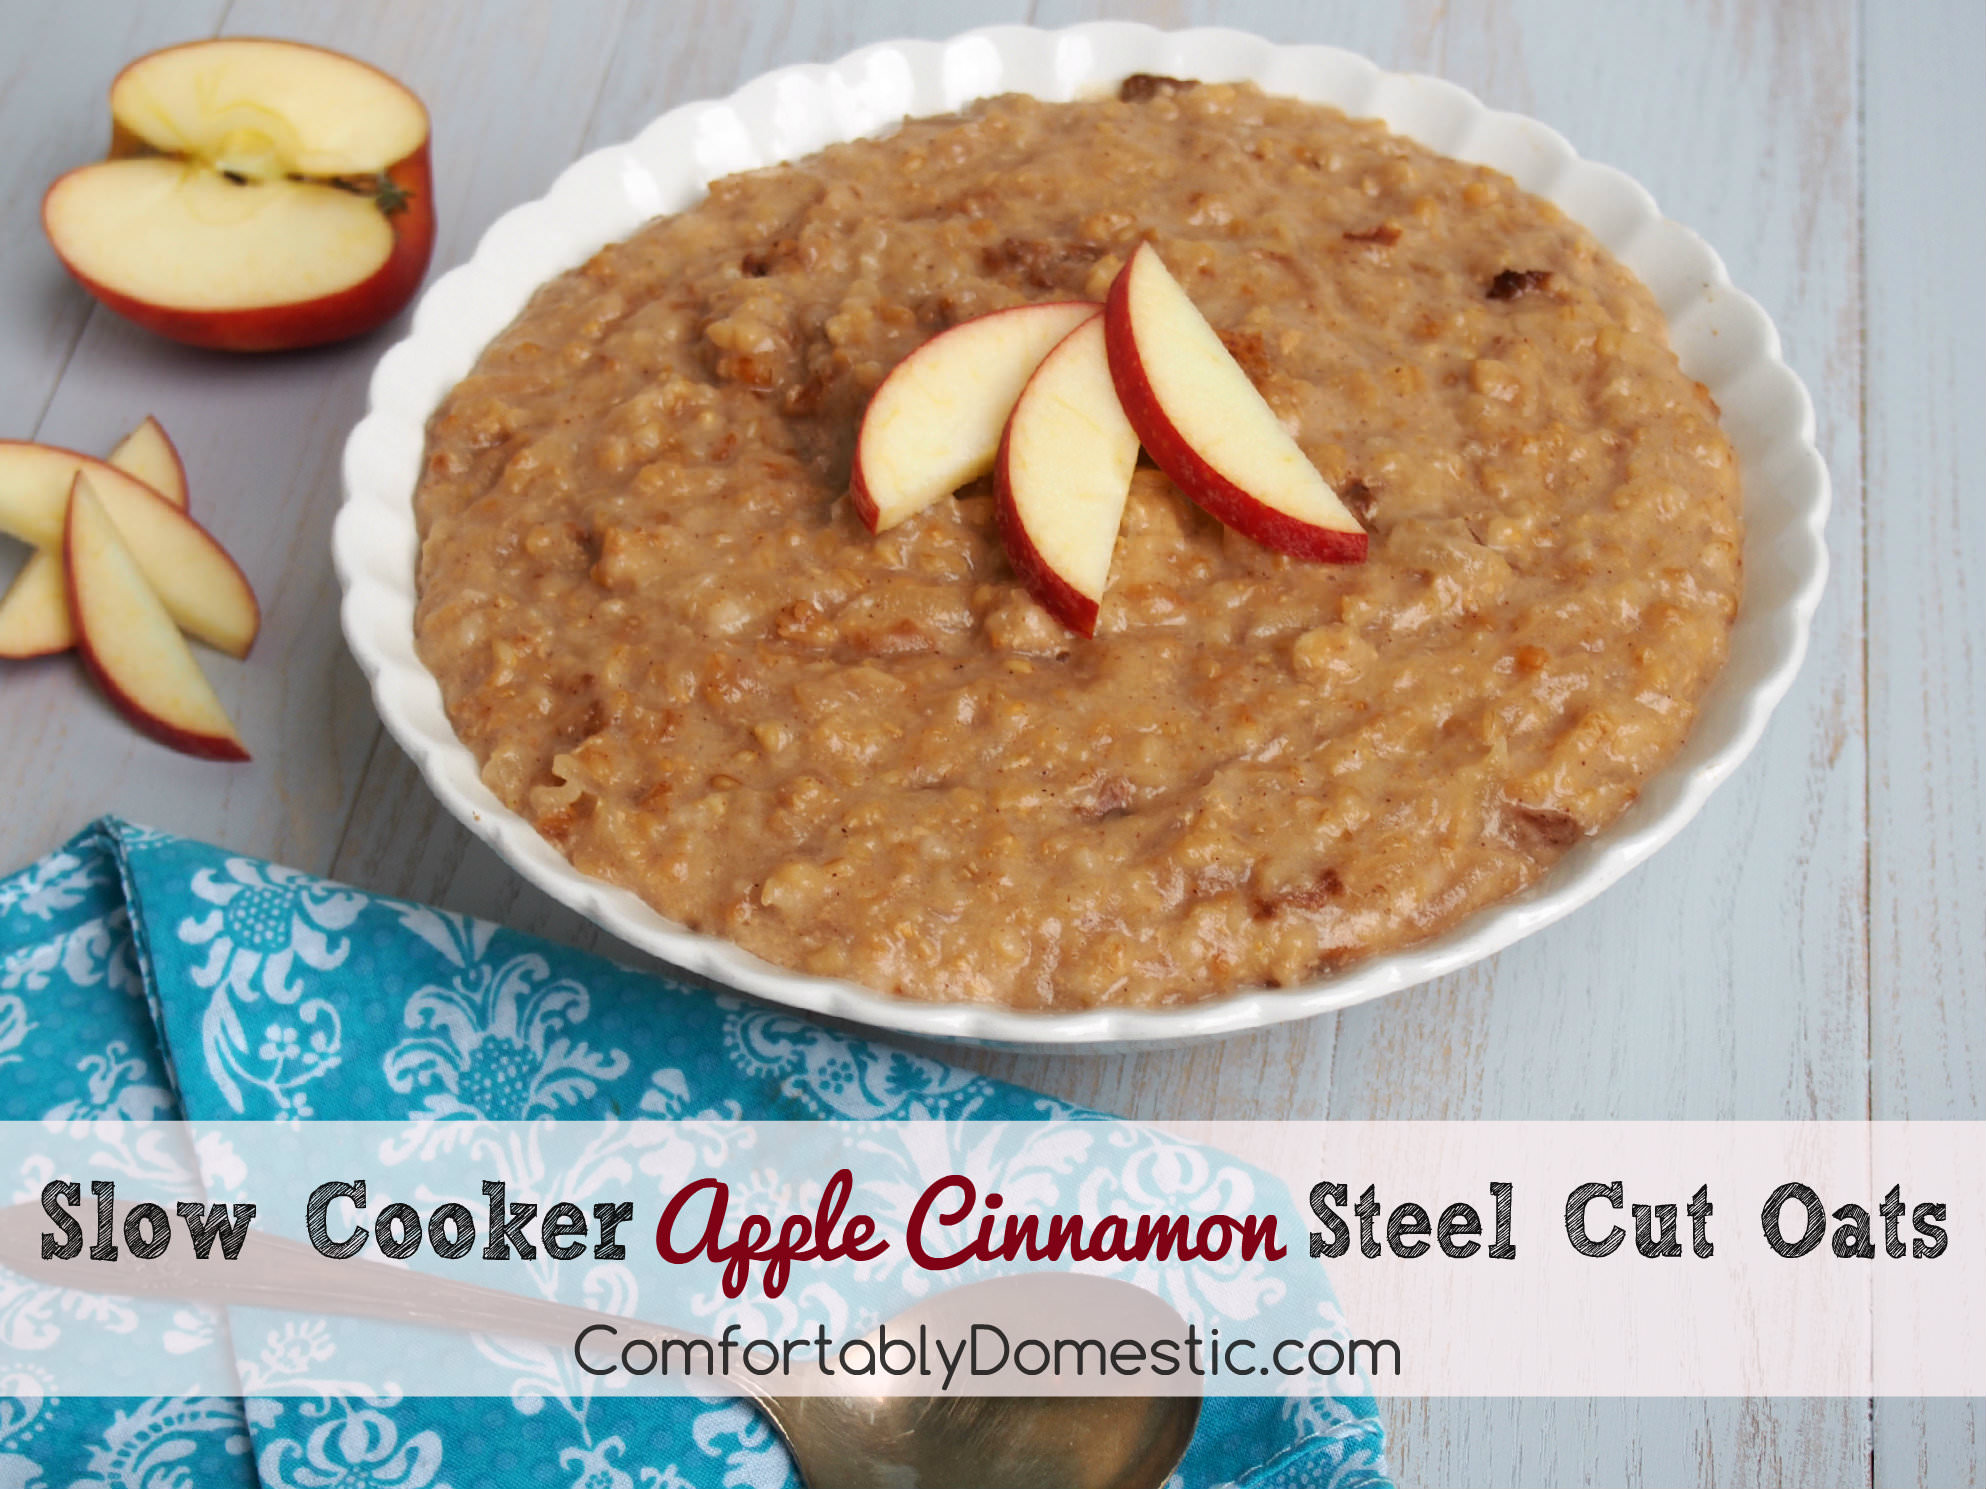 Slow Cooker Apple Cinnamon Steel Cut Oats | ComfortablyDomestic.com